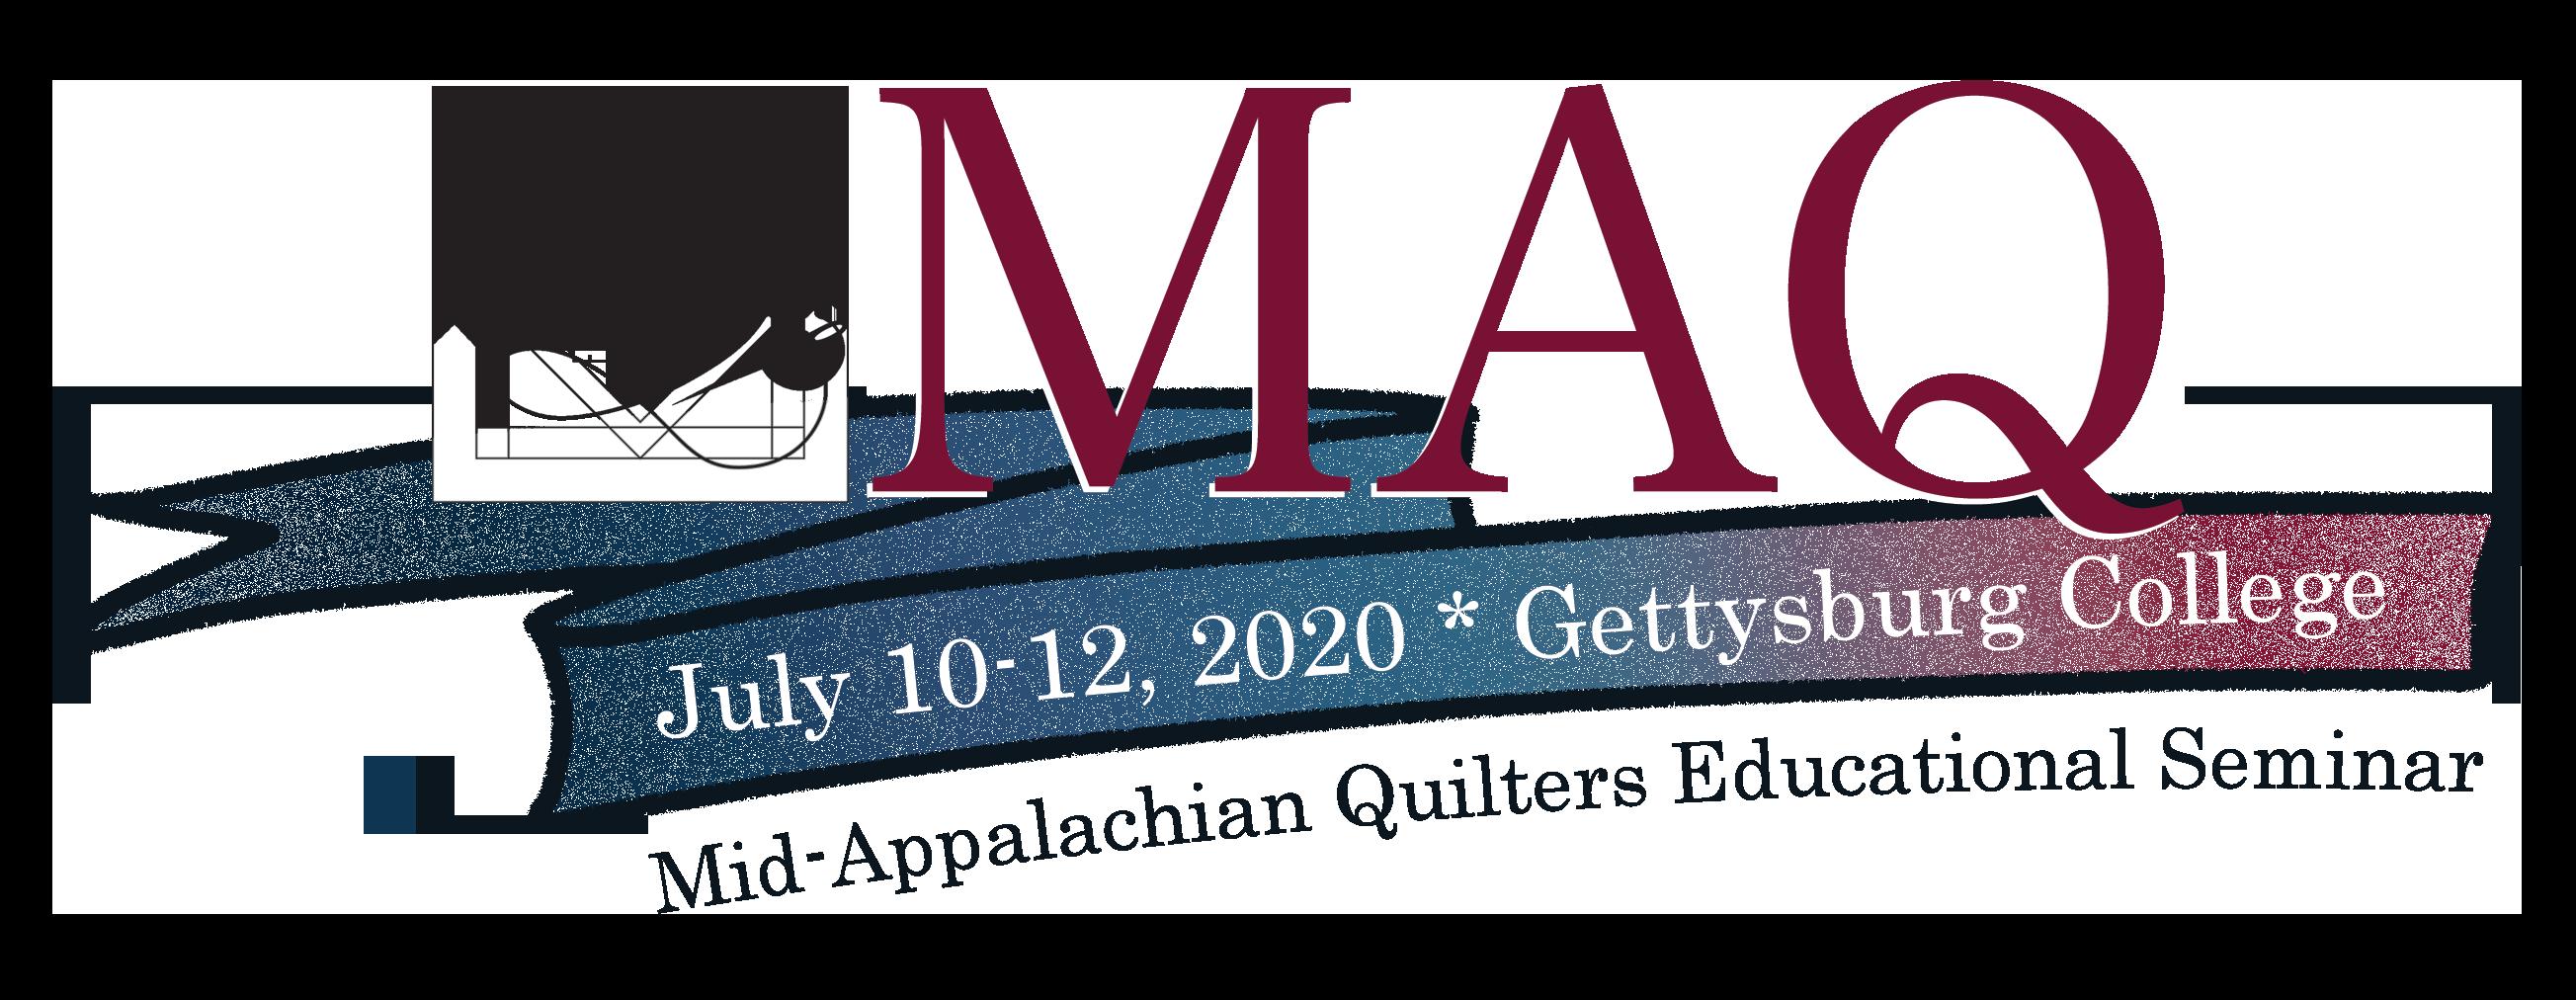 MAG Educational Seminar Logo